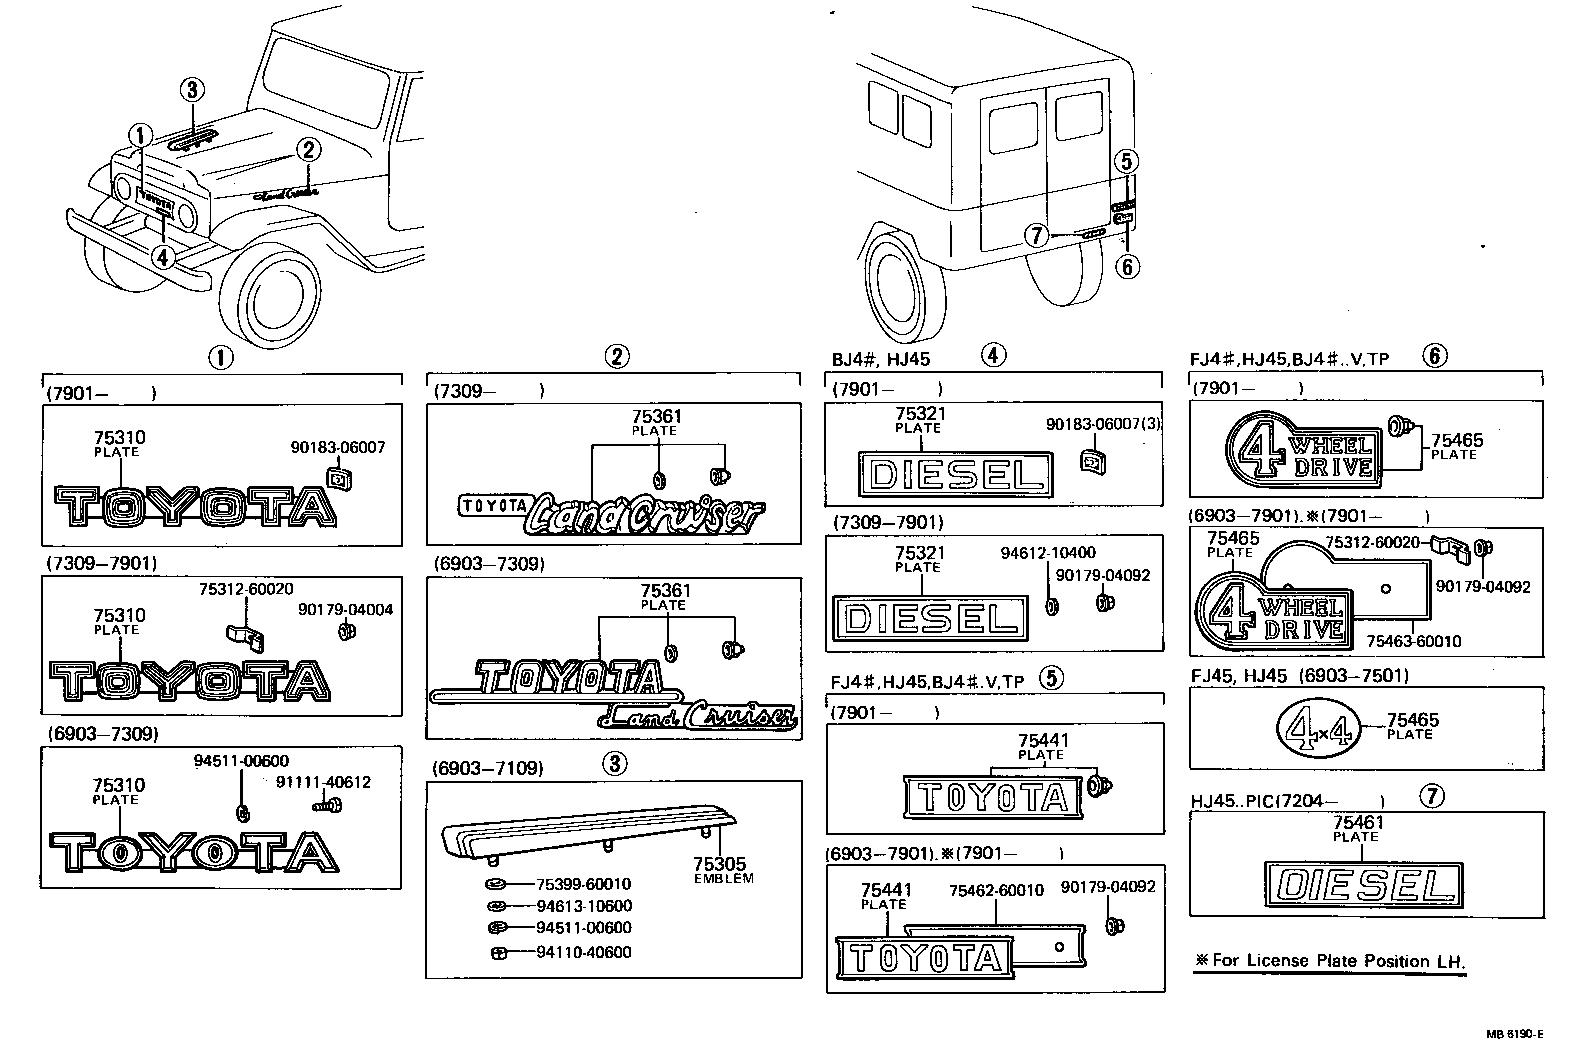 toyota land cruiser 40bj40-k - body